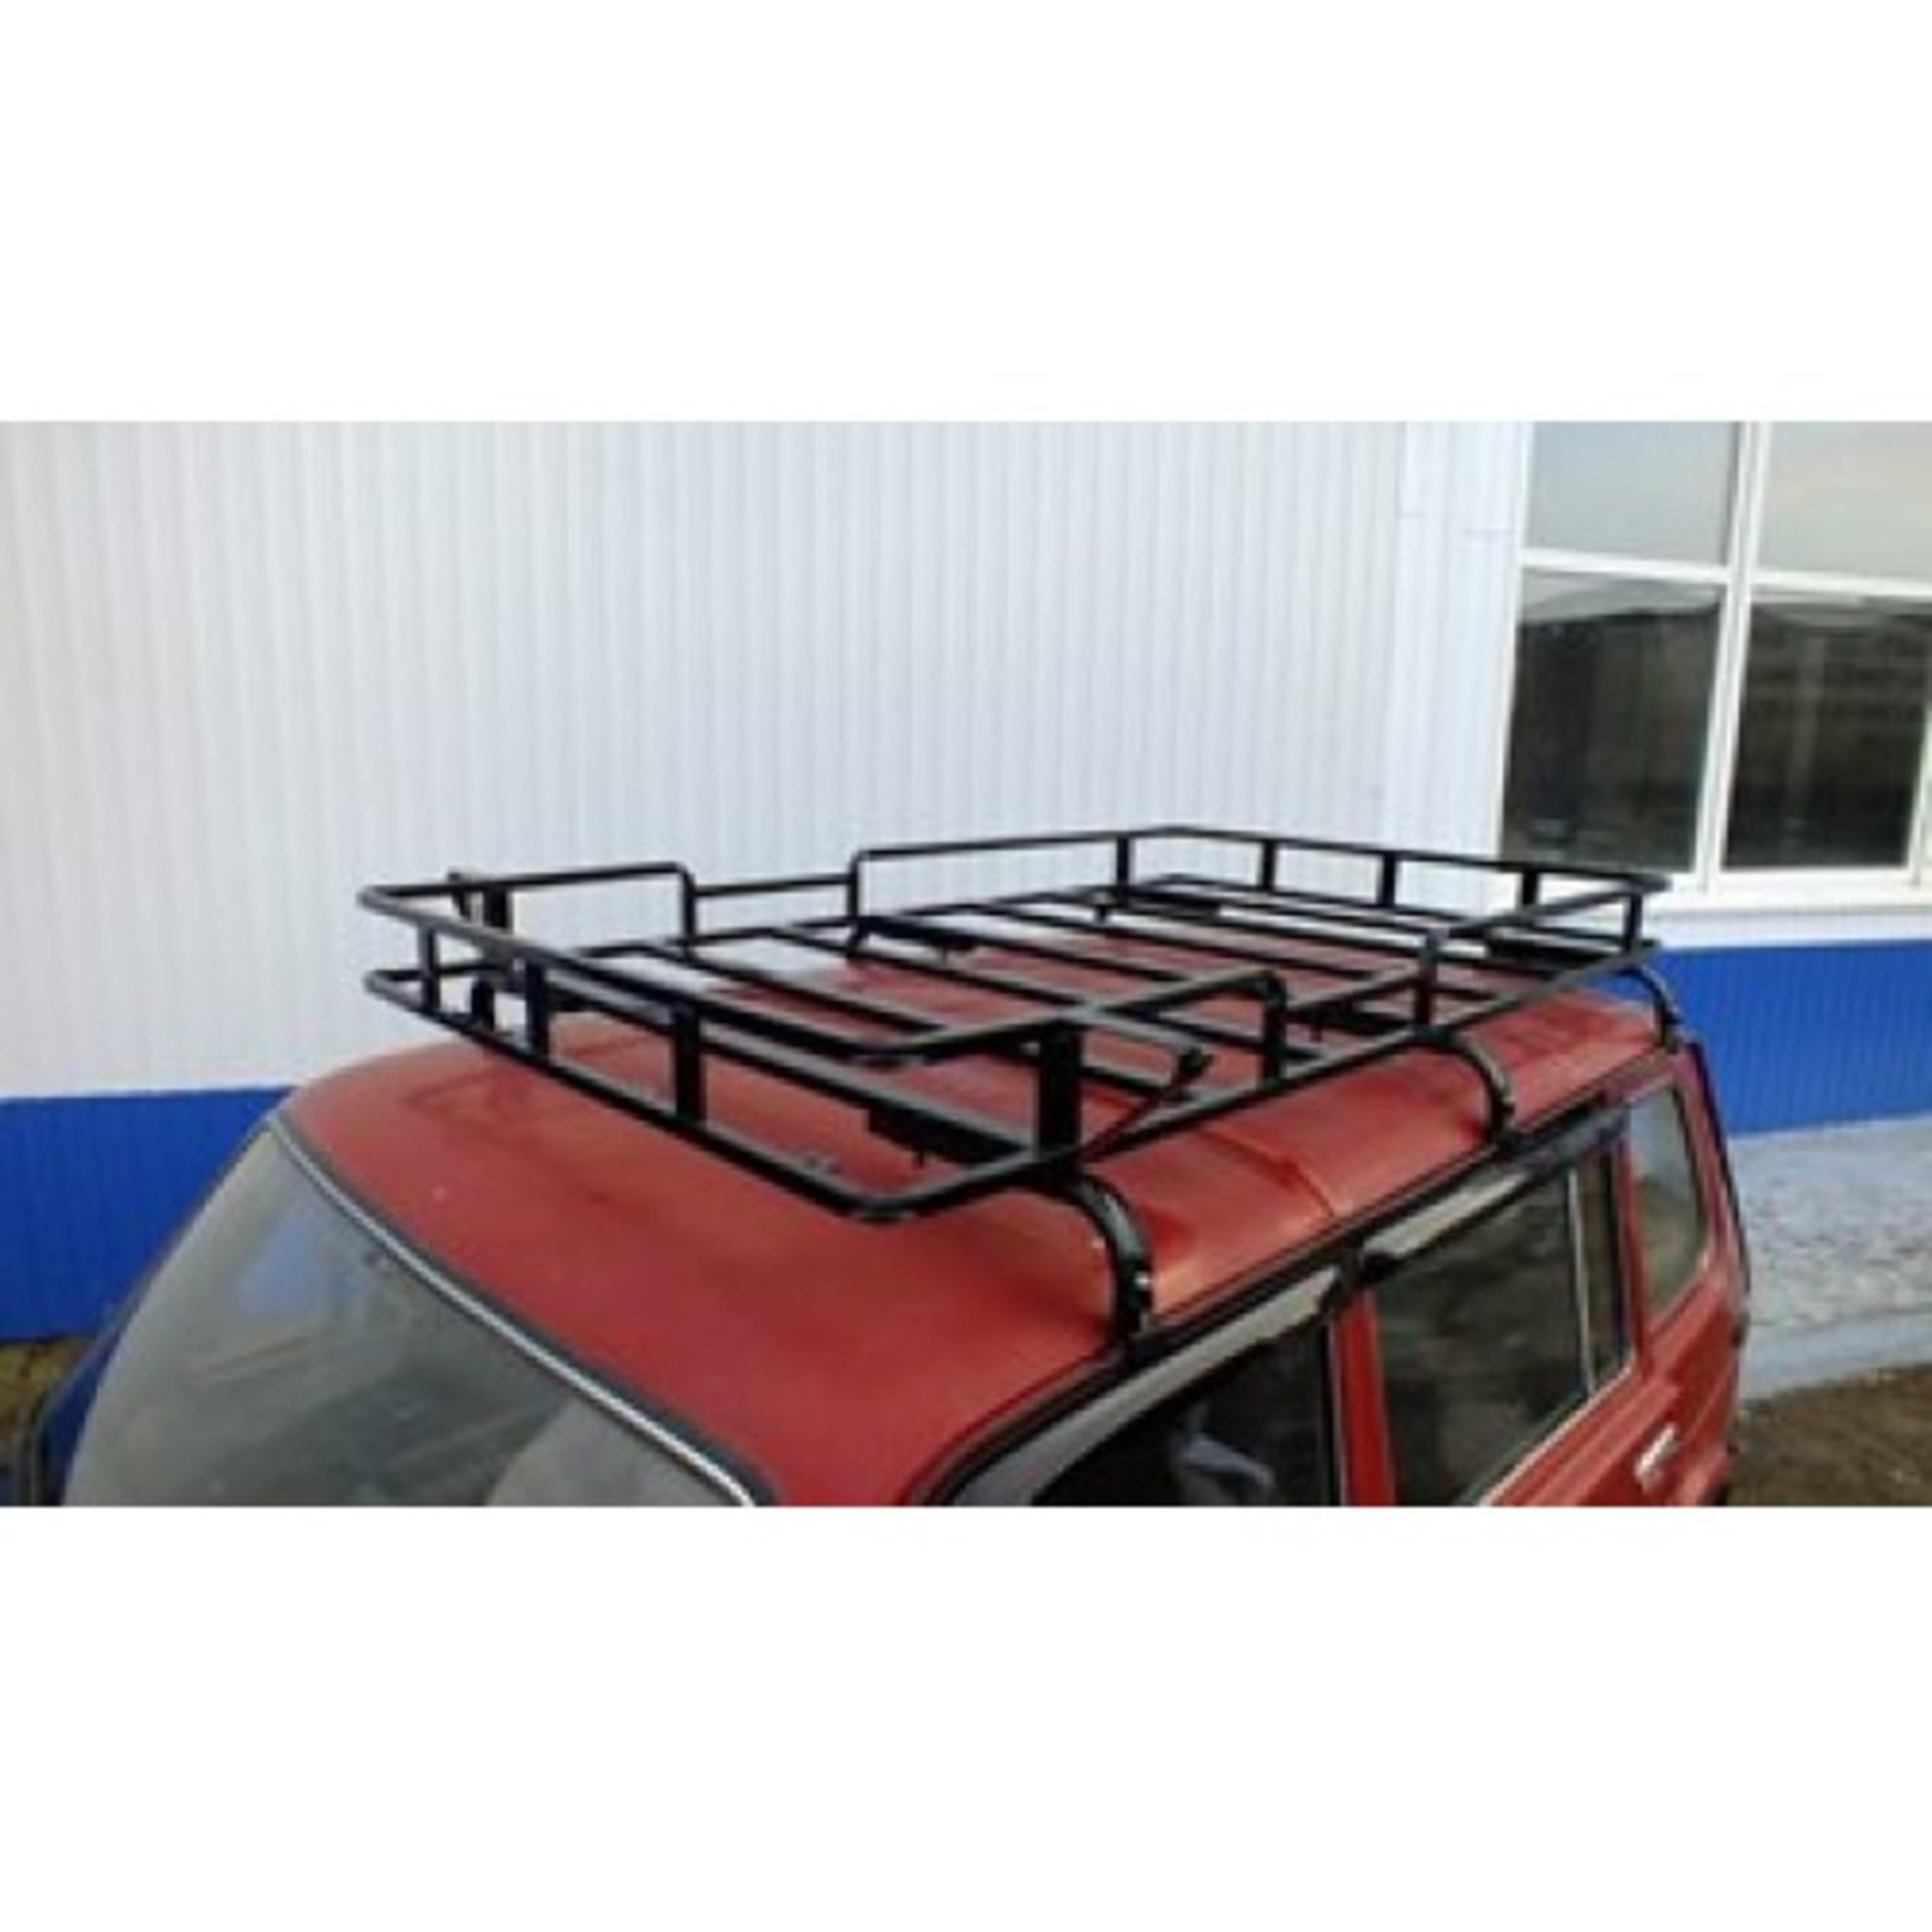 Багажник на НИВУ 2131 БРАКОНЬЕР (6 опор) с кронштейнами фар